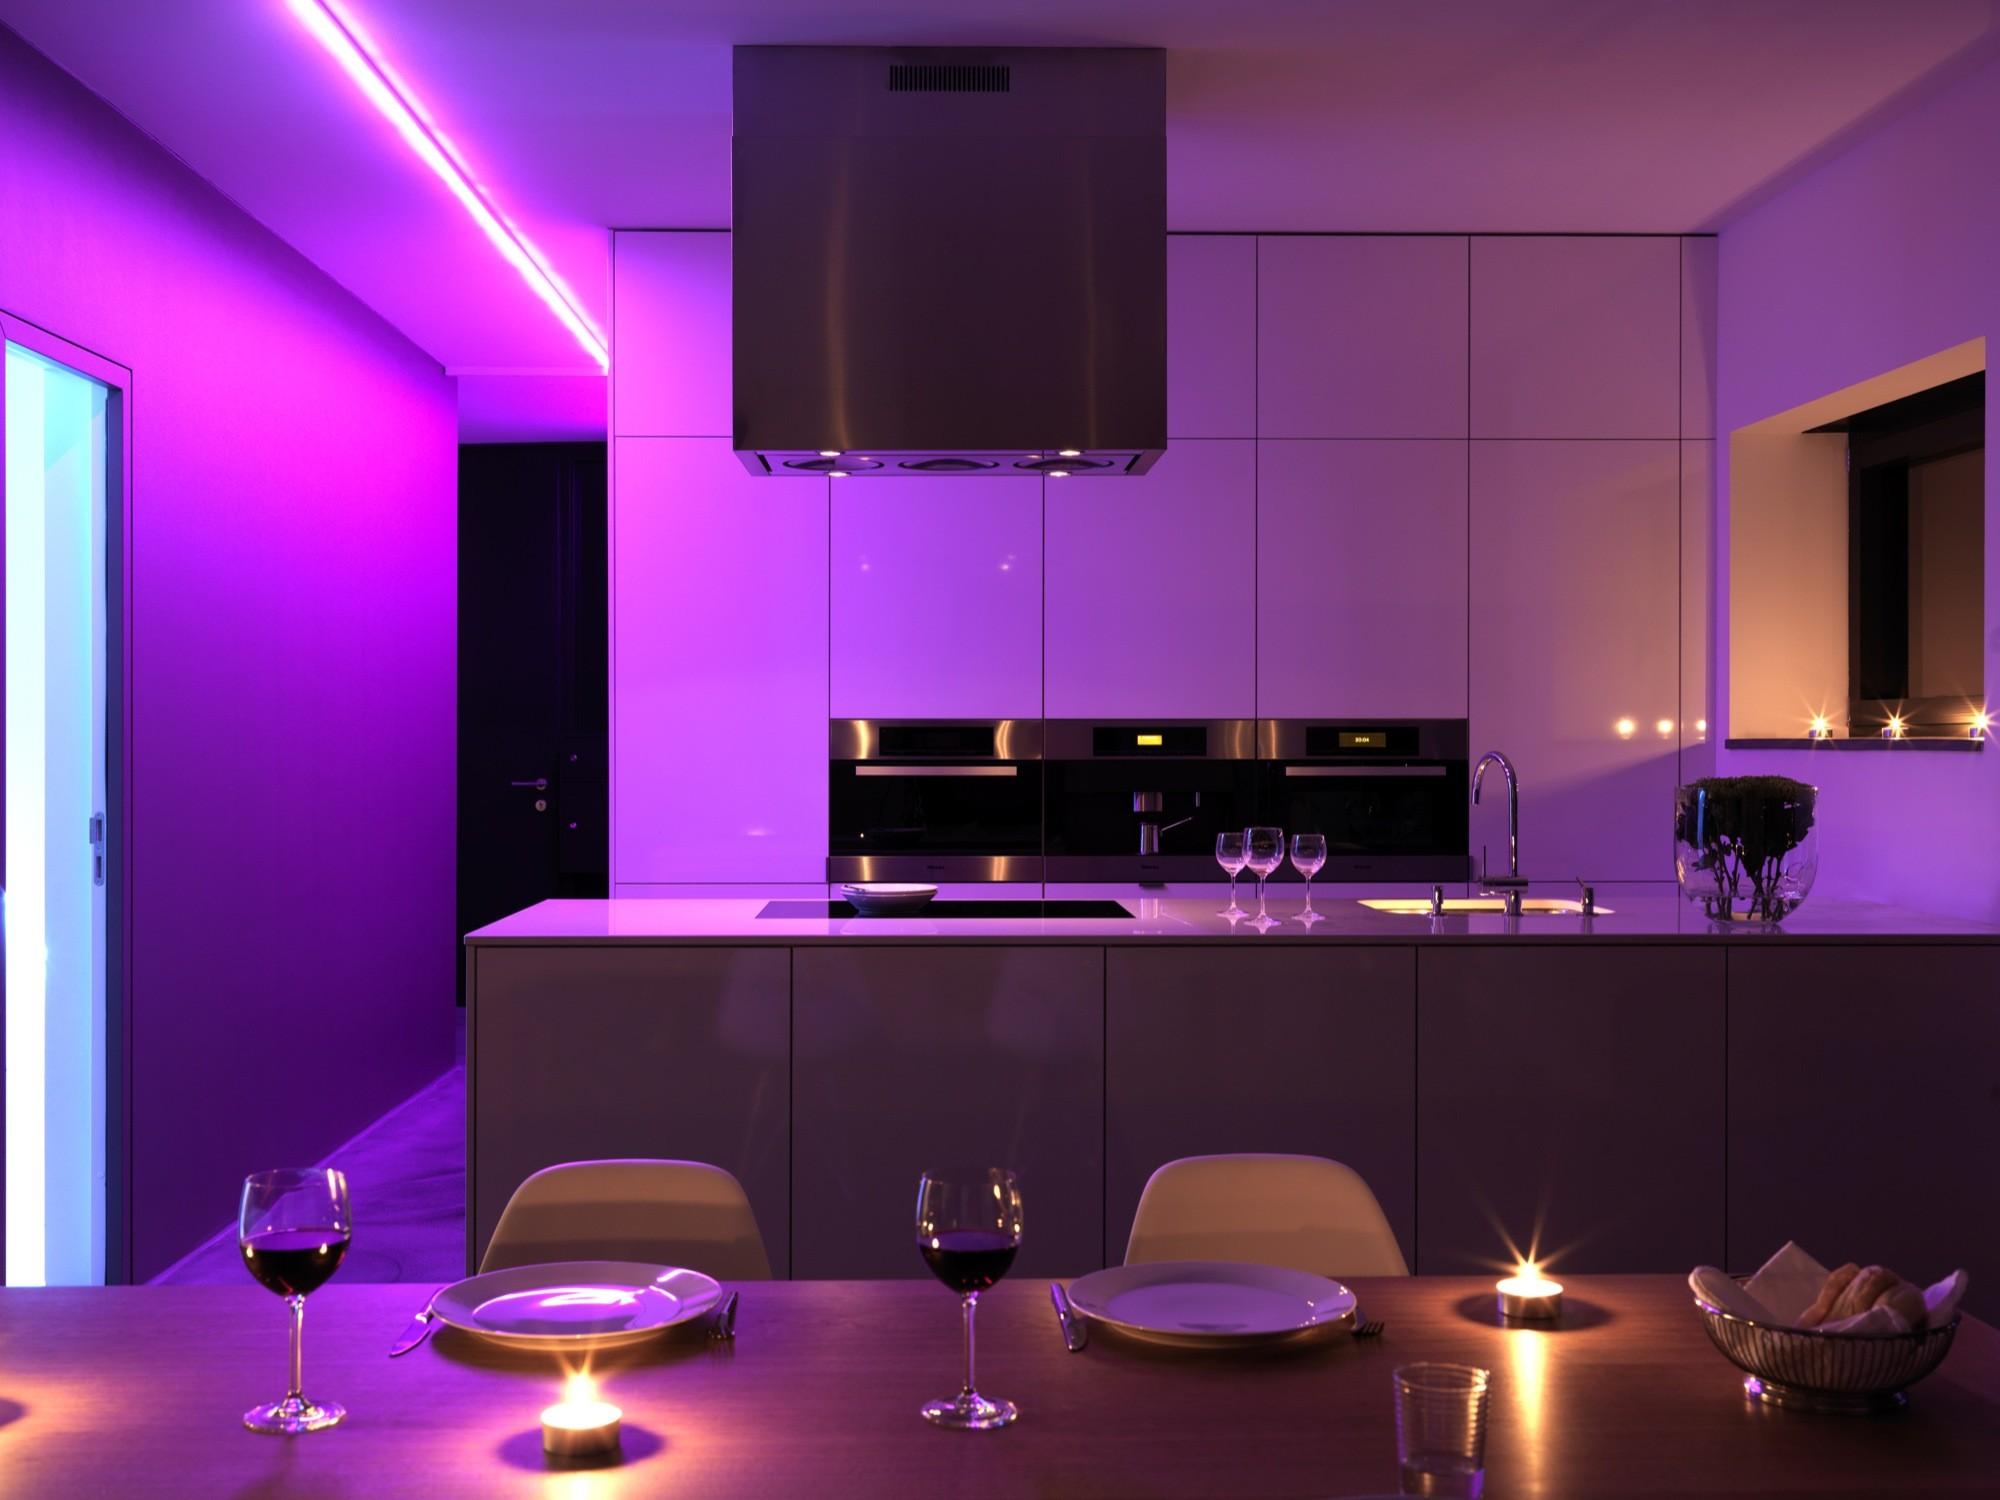 Light Pink Walls In Kitchen